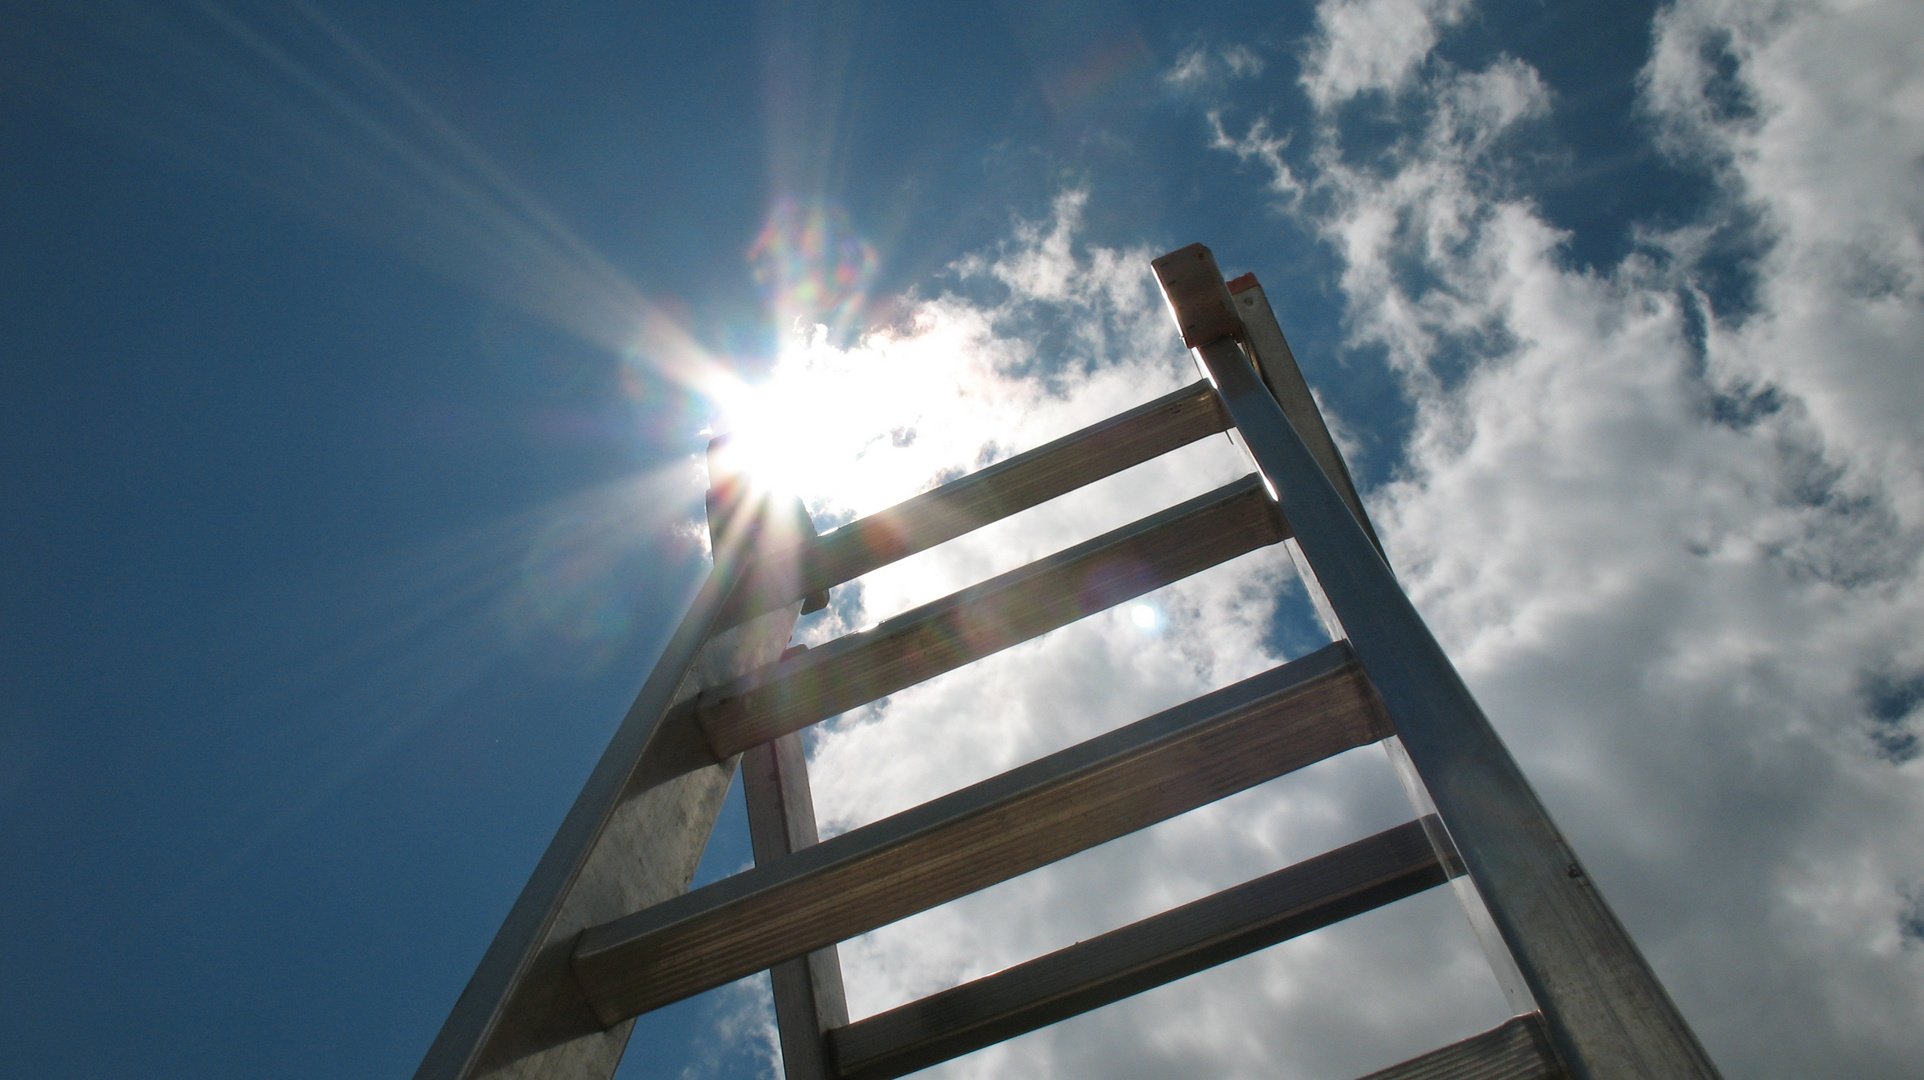 Leiter zur Sonne 2v2